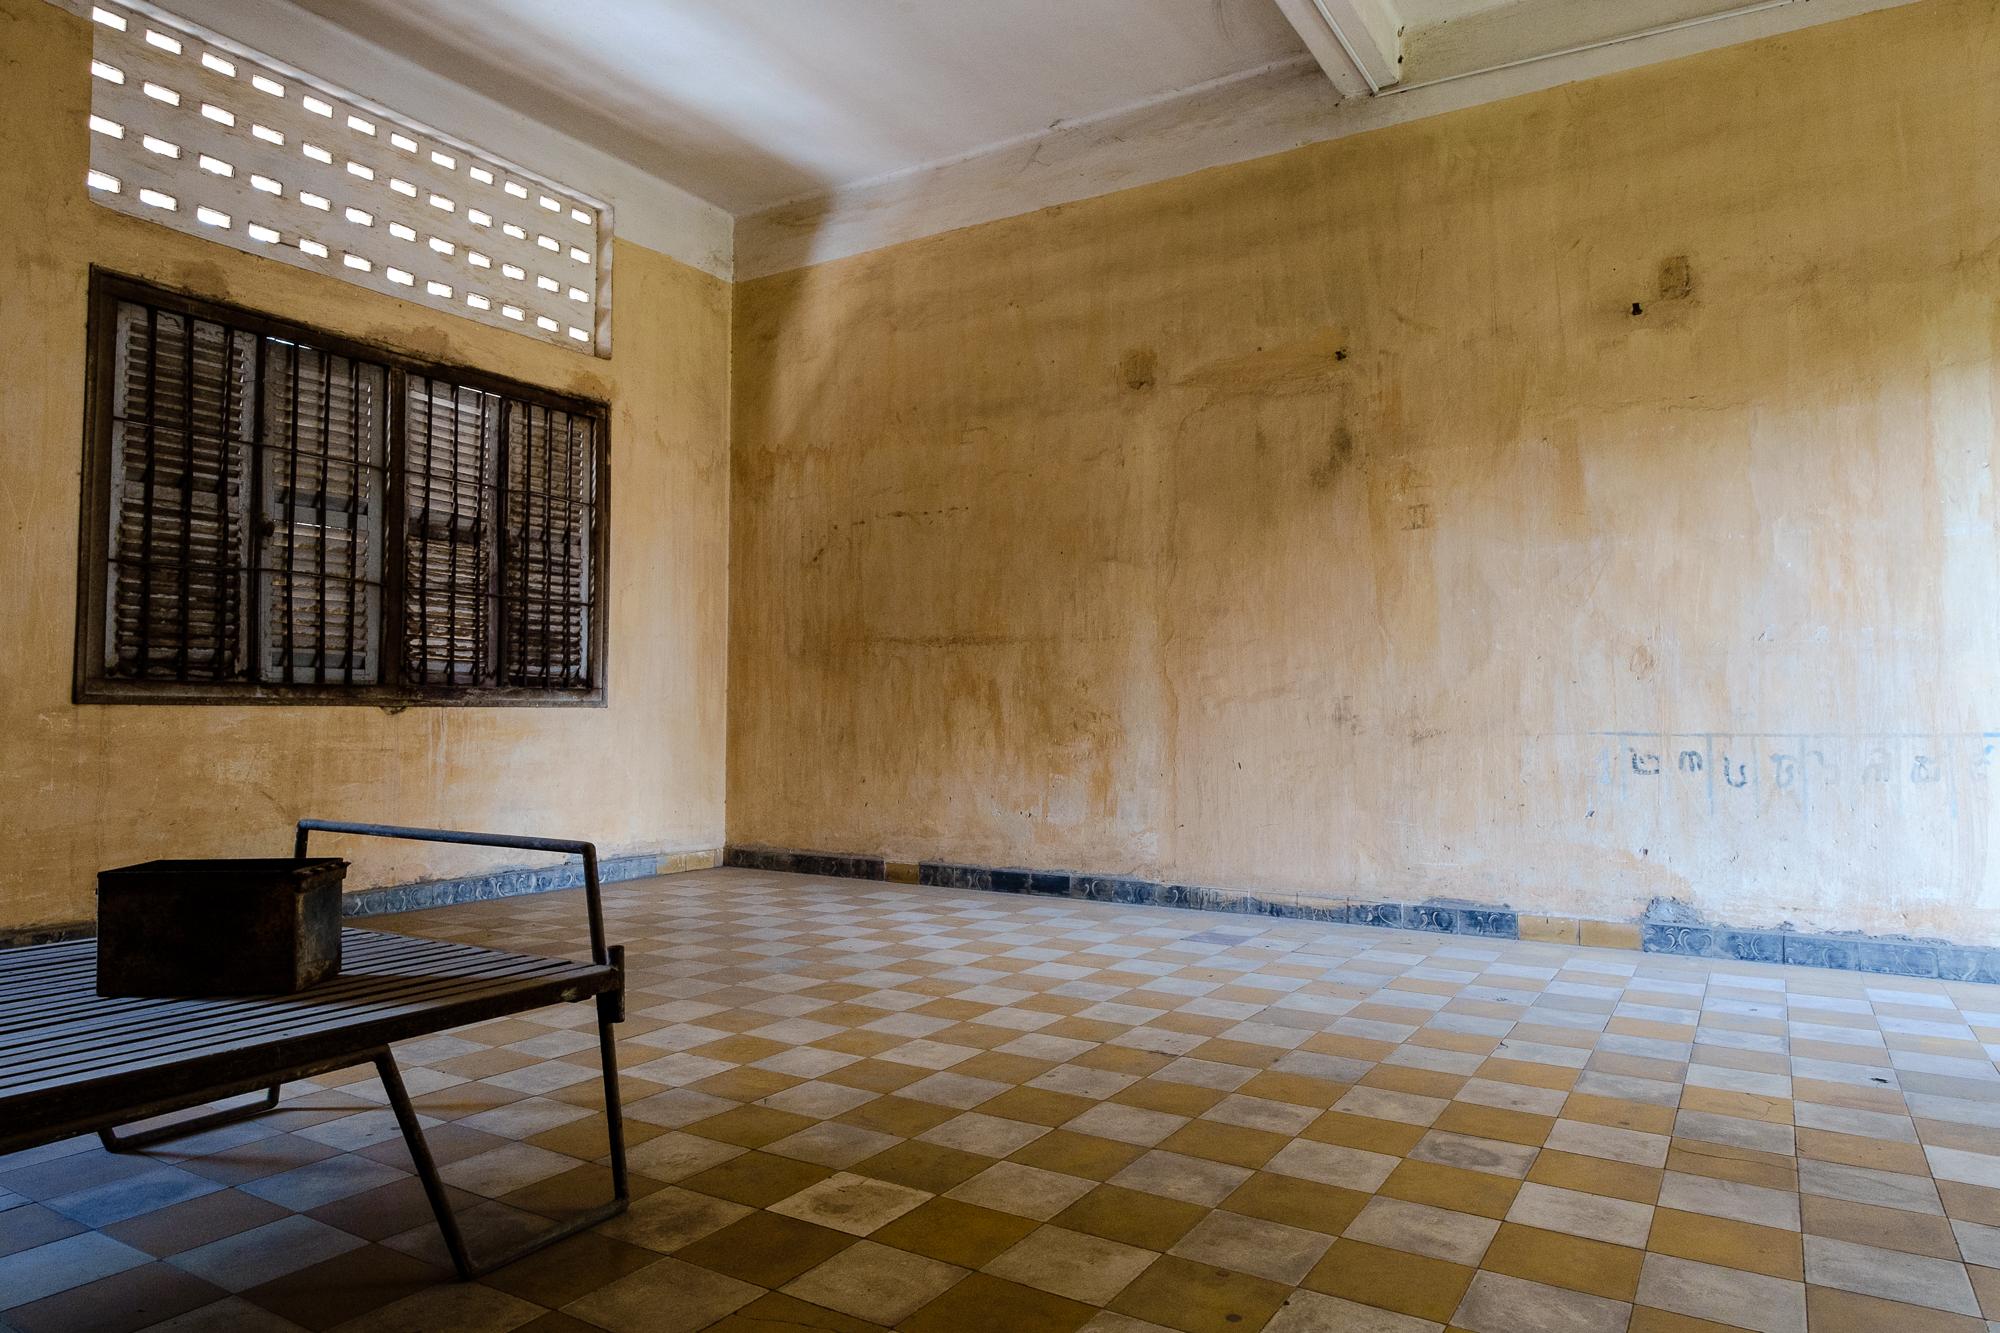 Phnom Penh - S-21 Prison